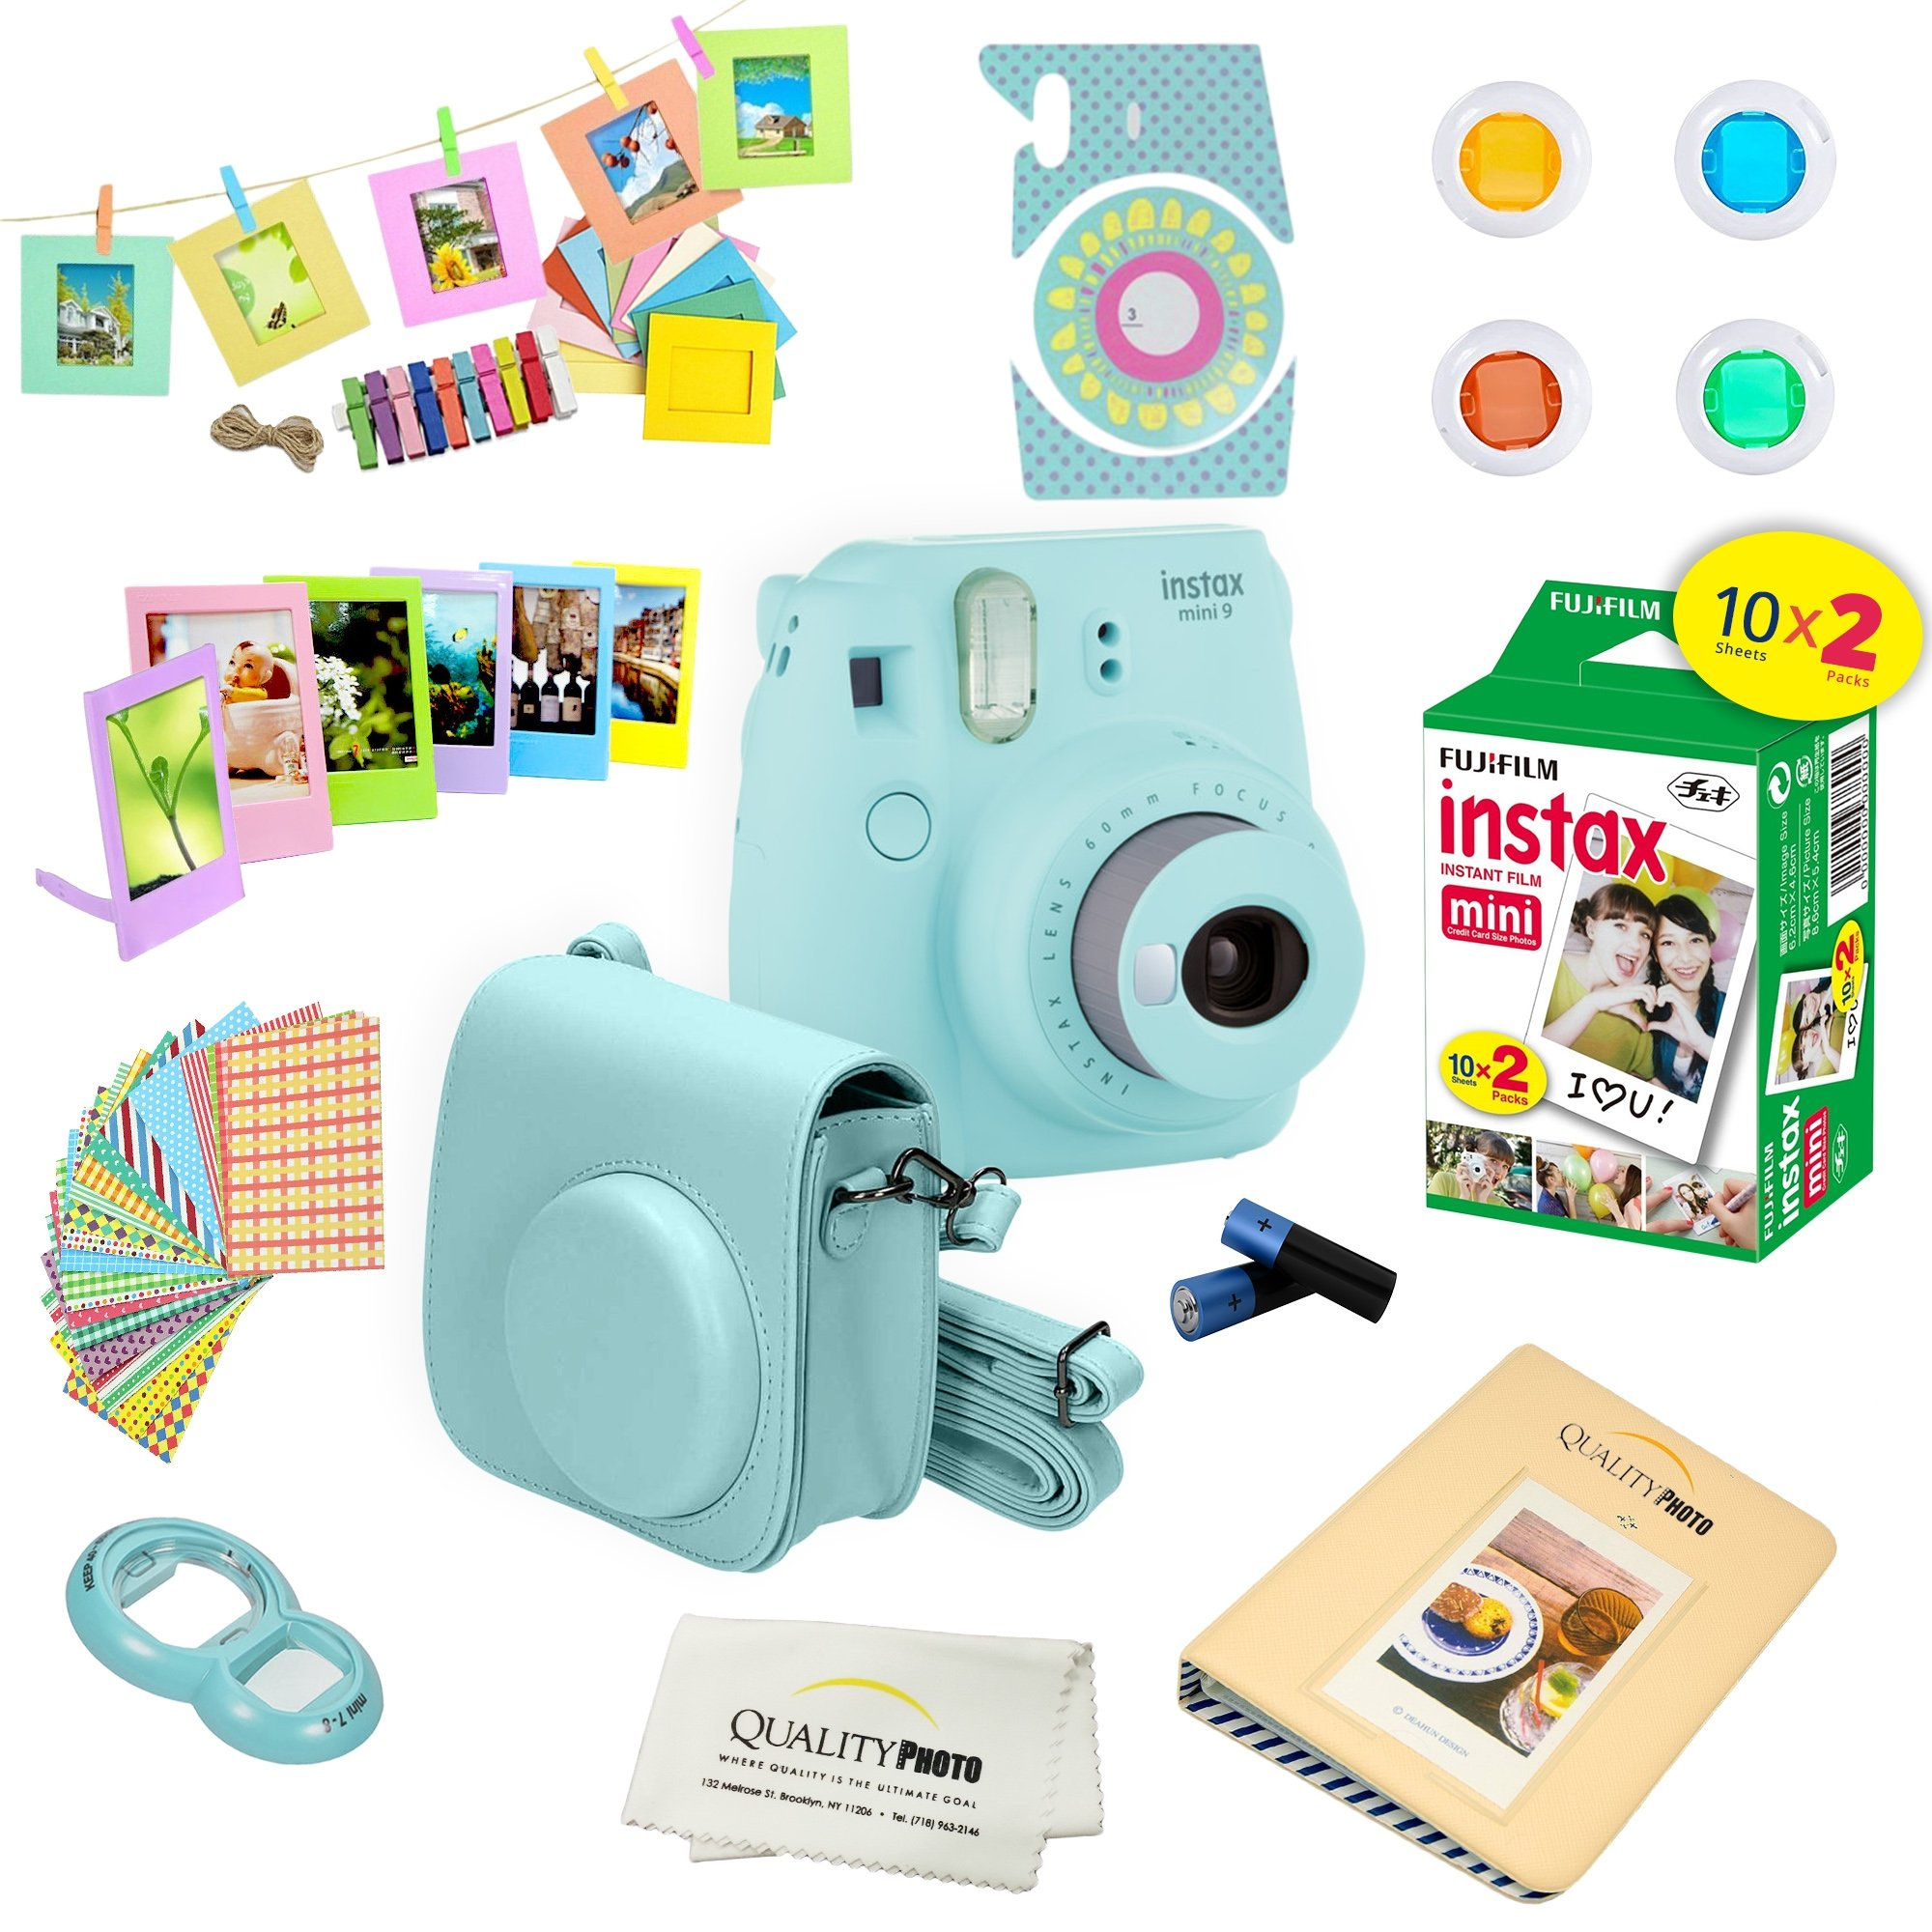 Fujifilm Instax Mini 9 Camera + Fuji INSTAX Instant Film (20 Sheets) + 14 PC Instax Accessories kit Bundle, Includes; Instax Case + Album + Frames & Stickers + Lens Filters + More (Ice Blue)